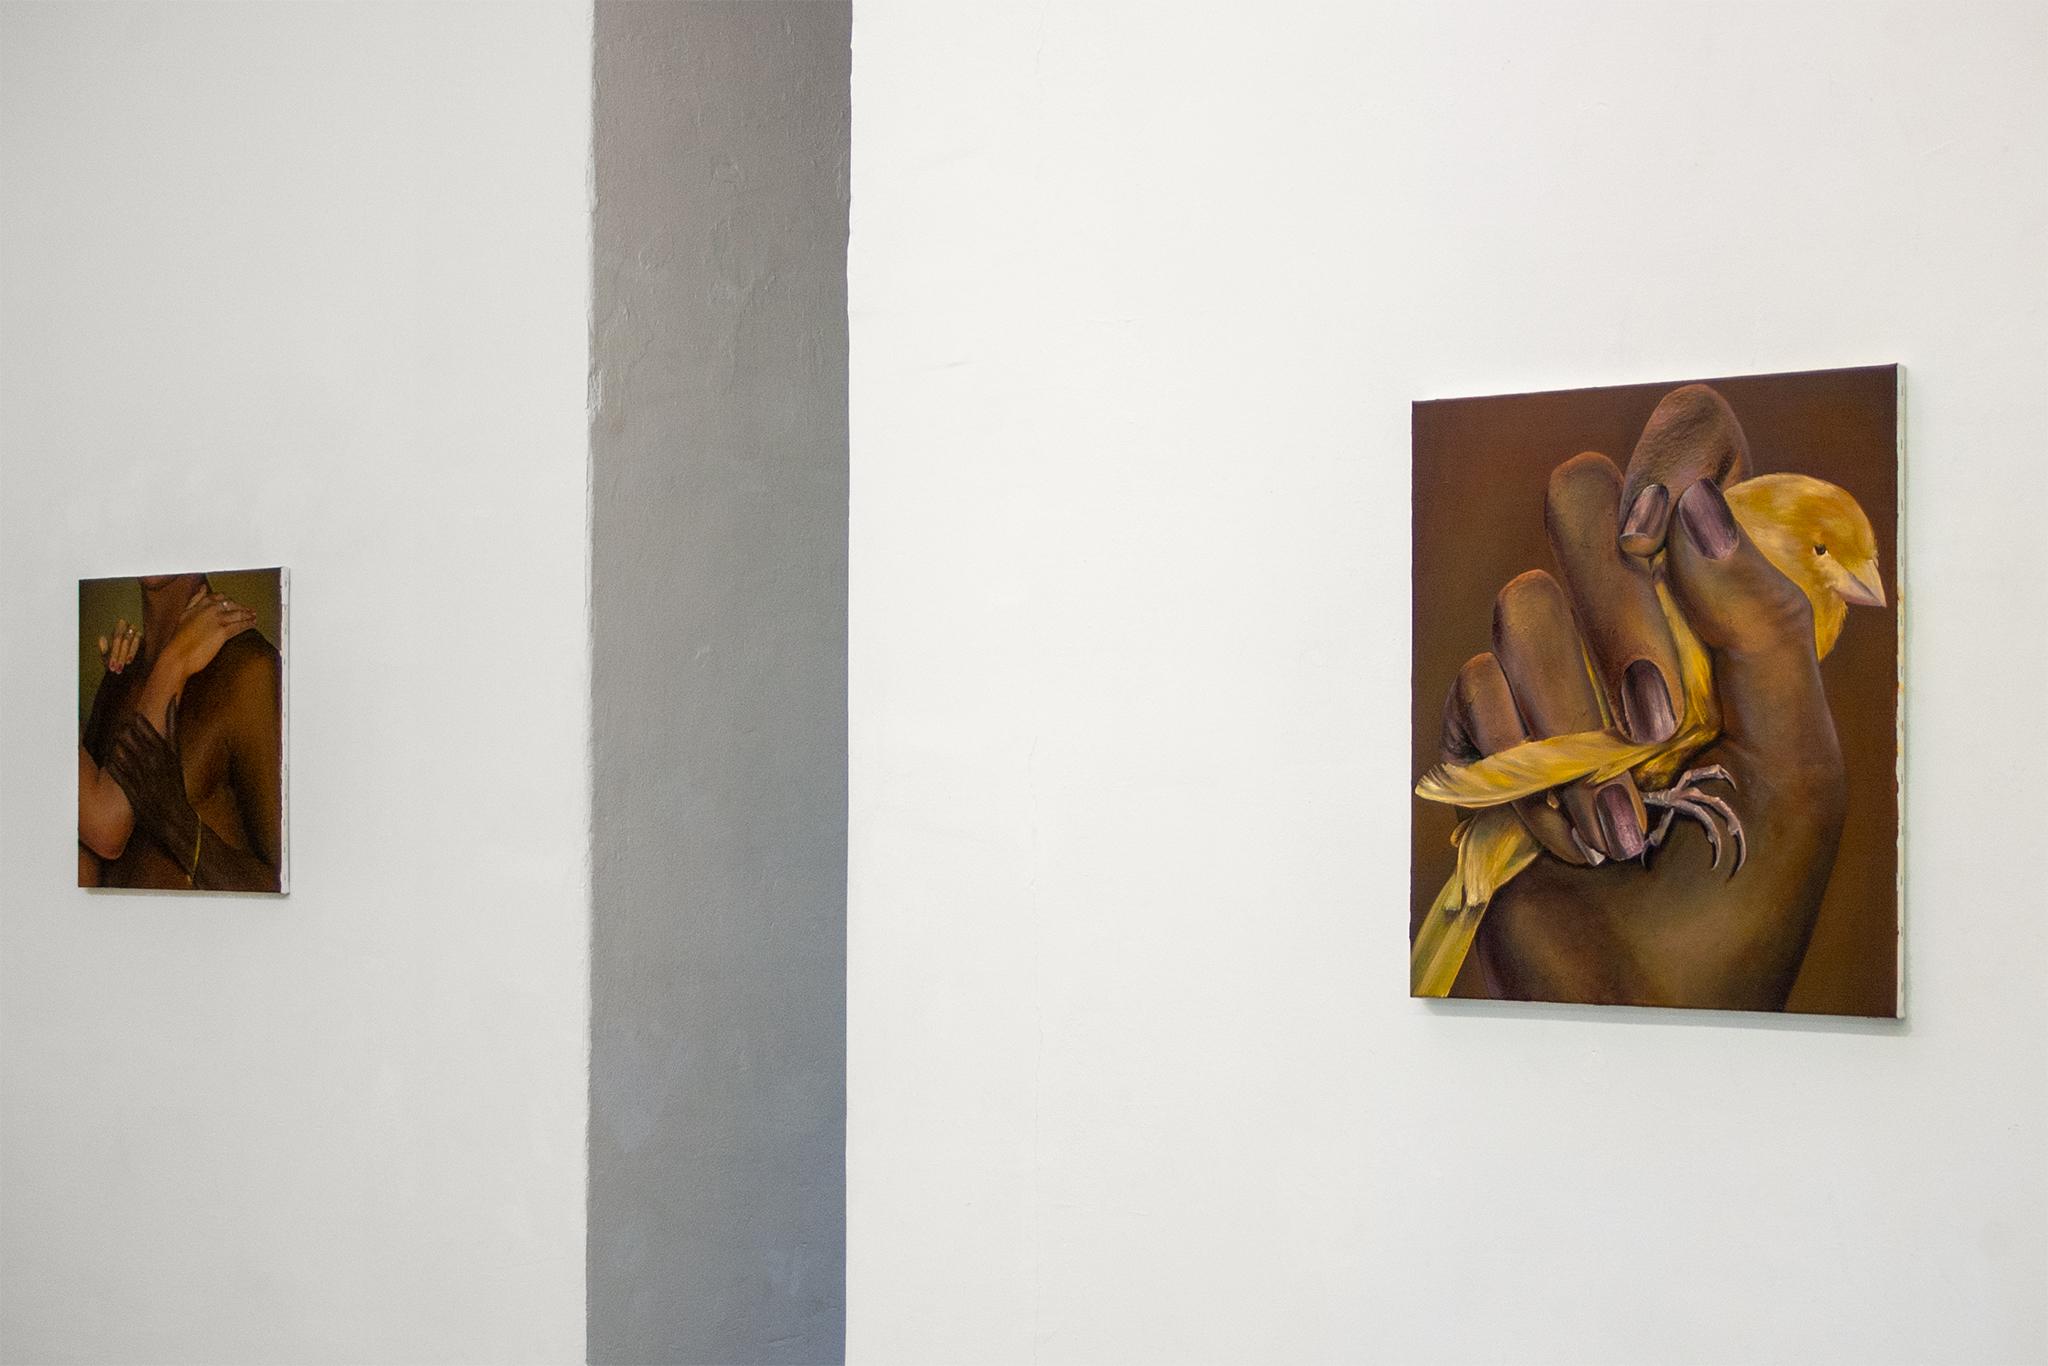 Ina_van_Zyl_-Galerie-Onrust-EX-walk-run_08.jpg